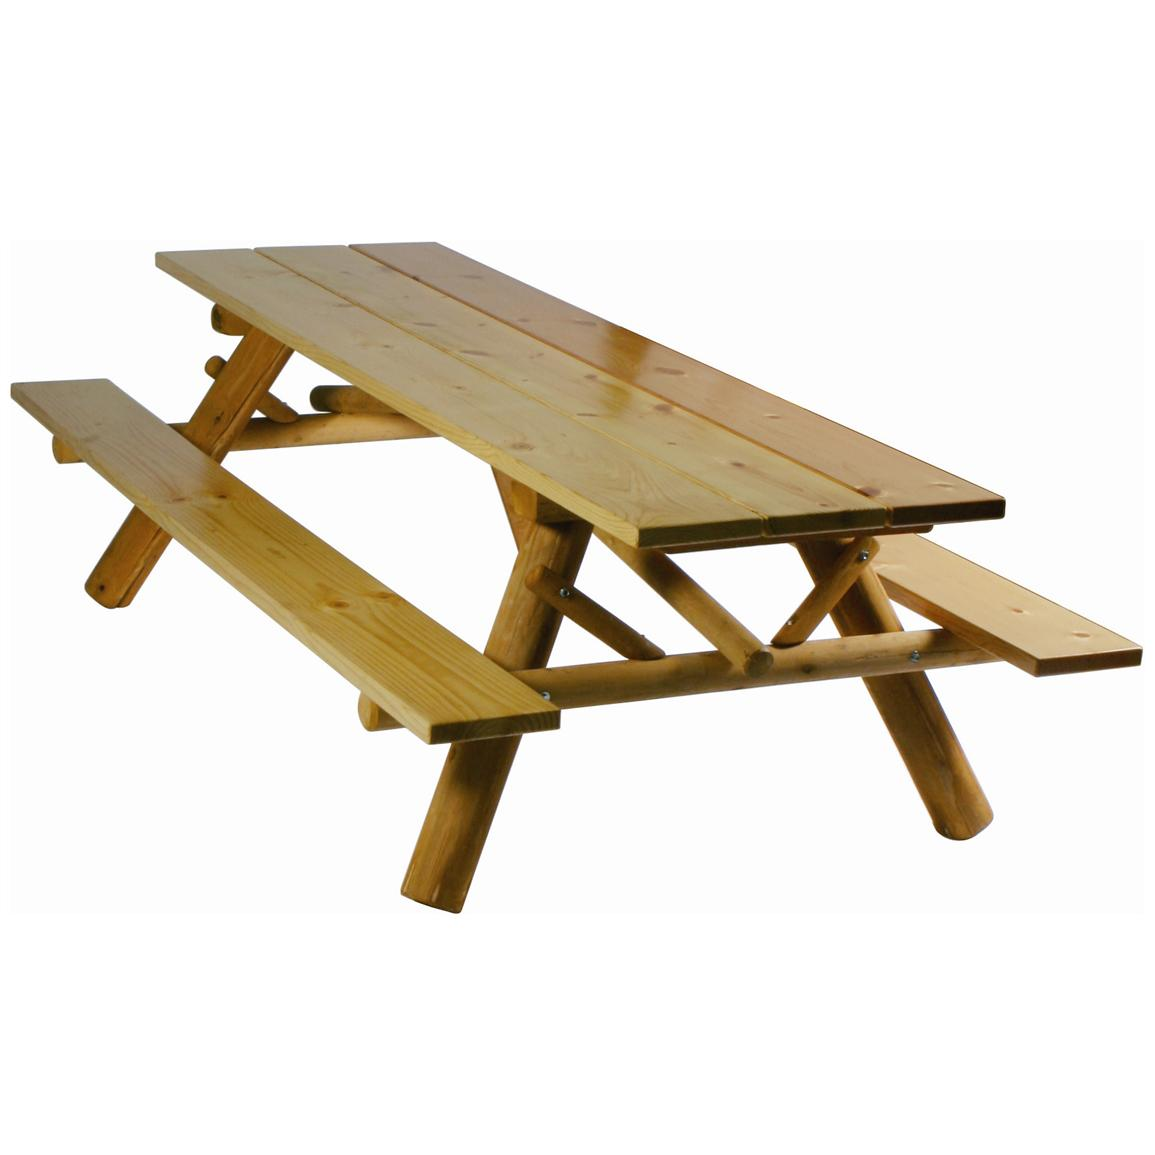 6 Foot Picnic Table Plans .-6 Foot Picnic Table Plans .-0